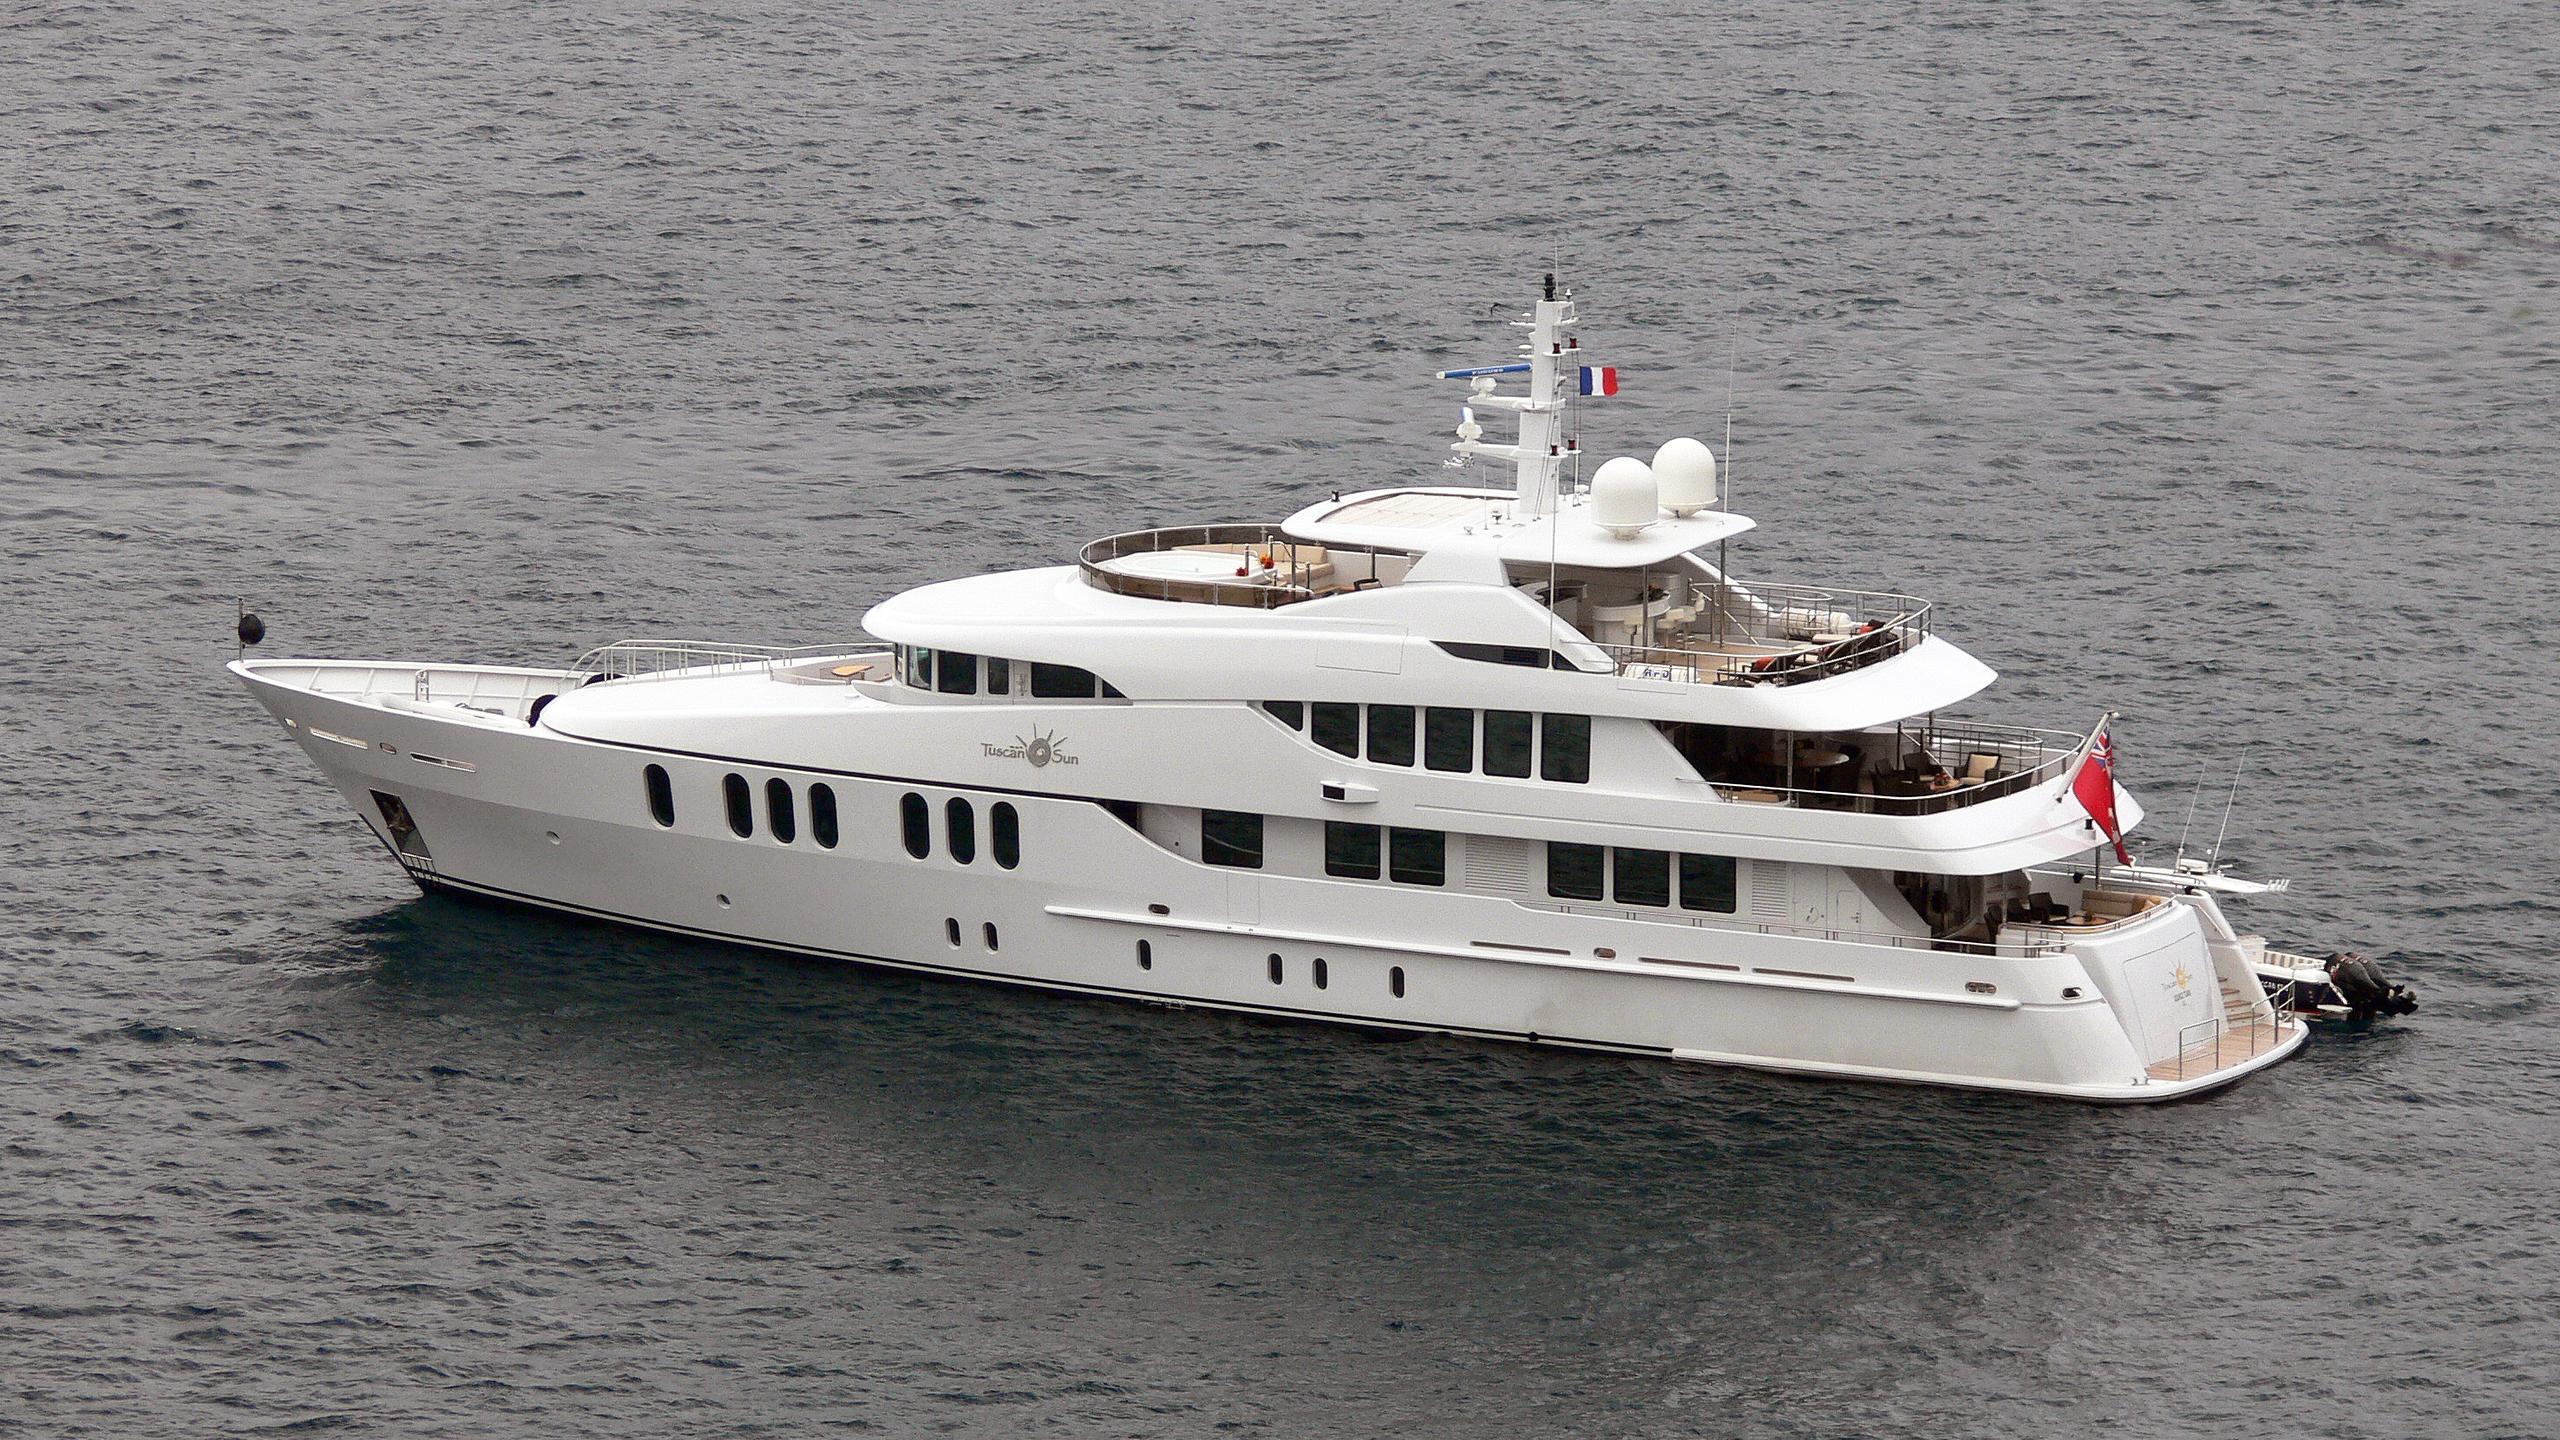 coco-viente-tuscan-sun-motor-yacht-izar-2006-45m-half-profile